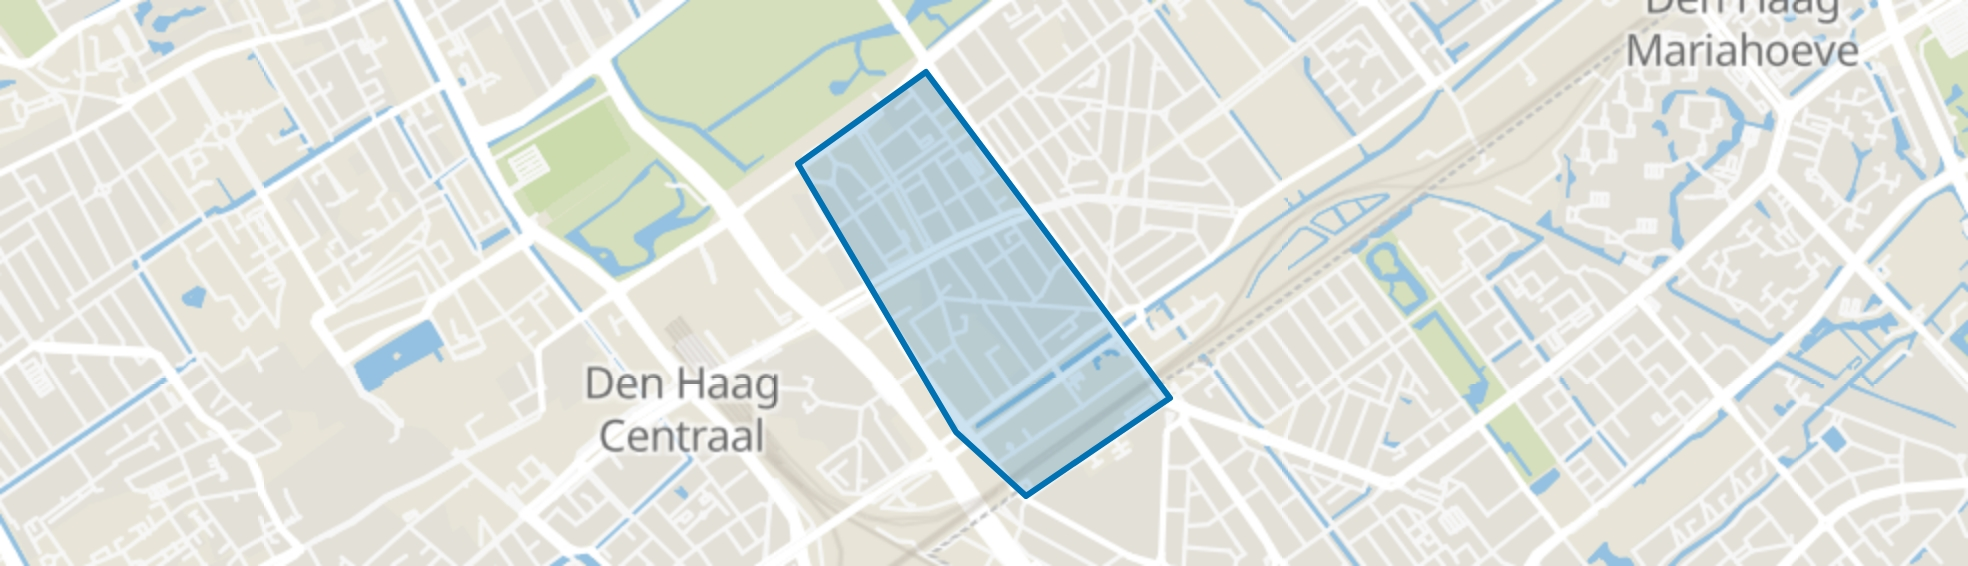 Bezuidenhout-Midden, Den Haag map